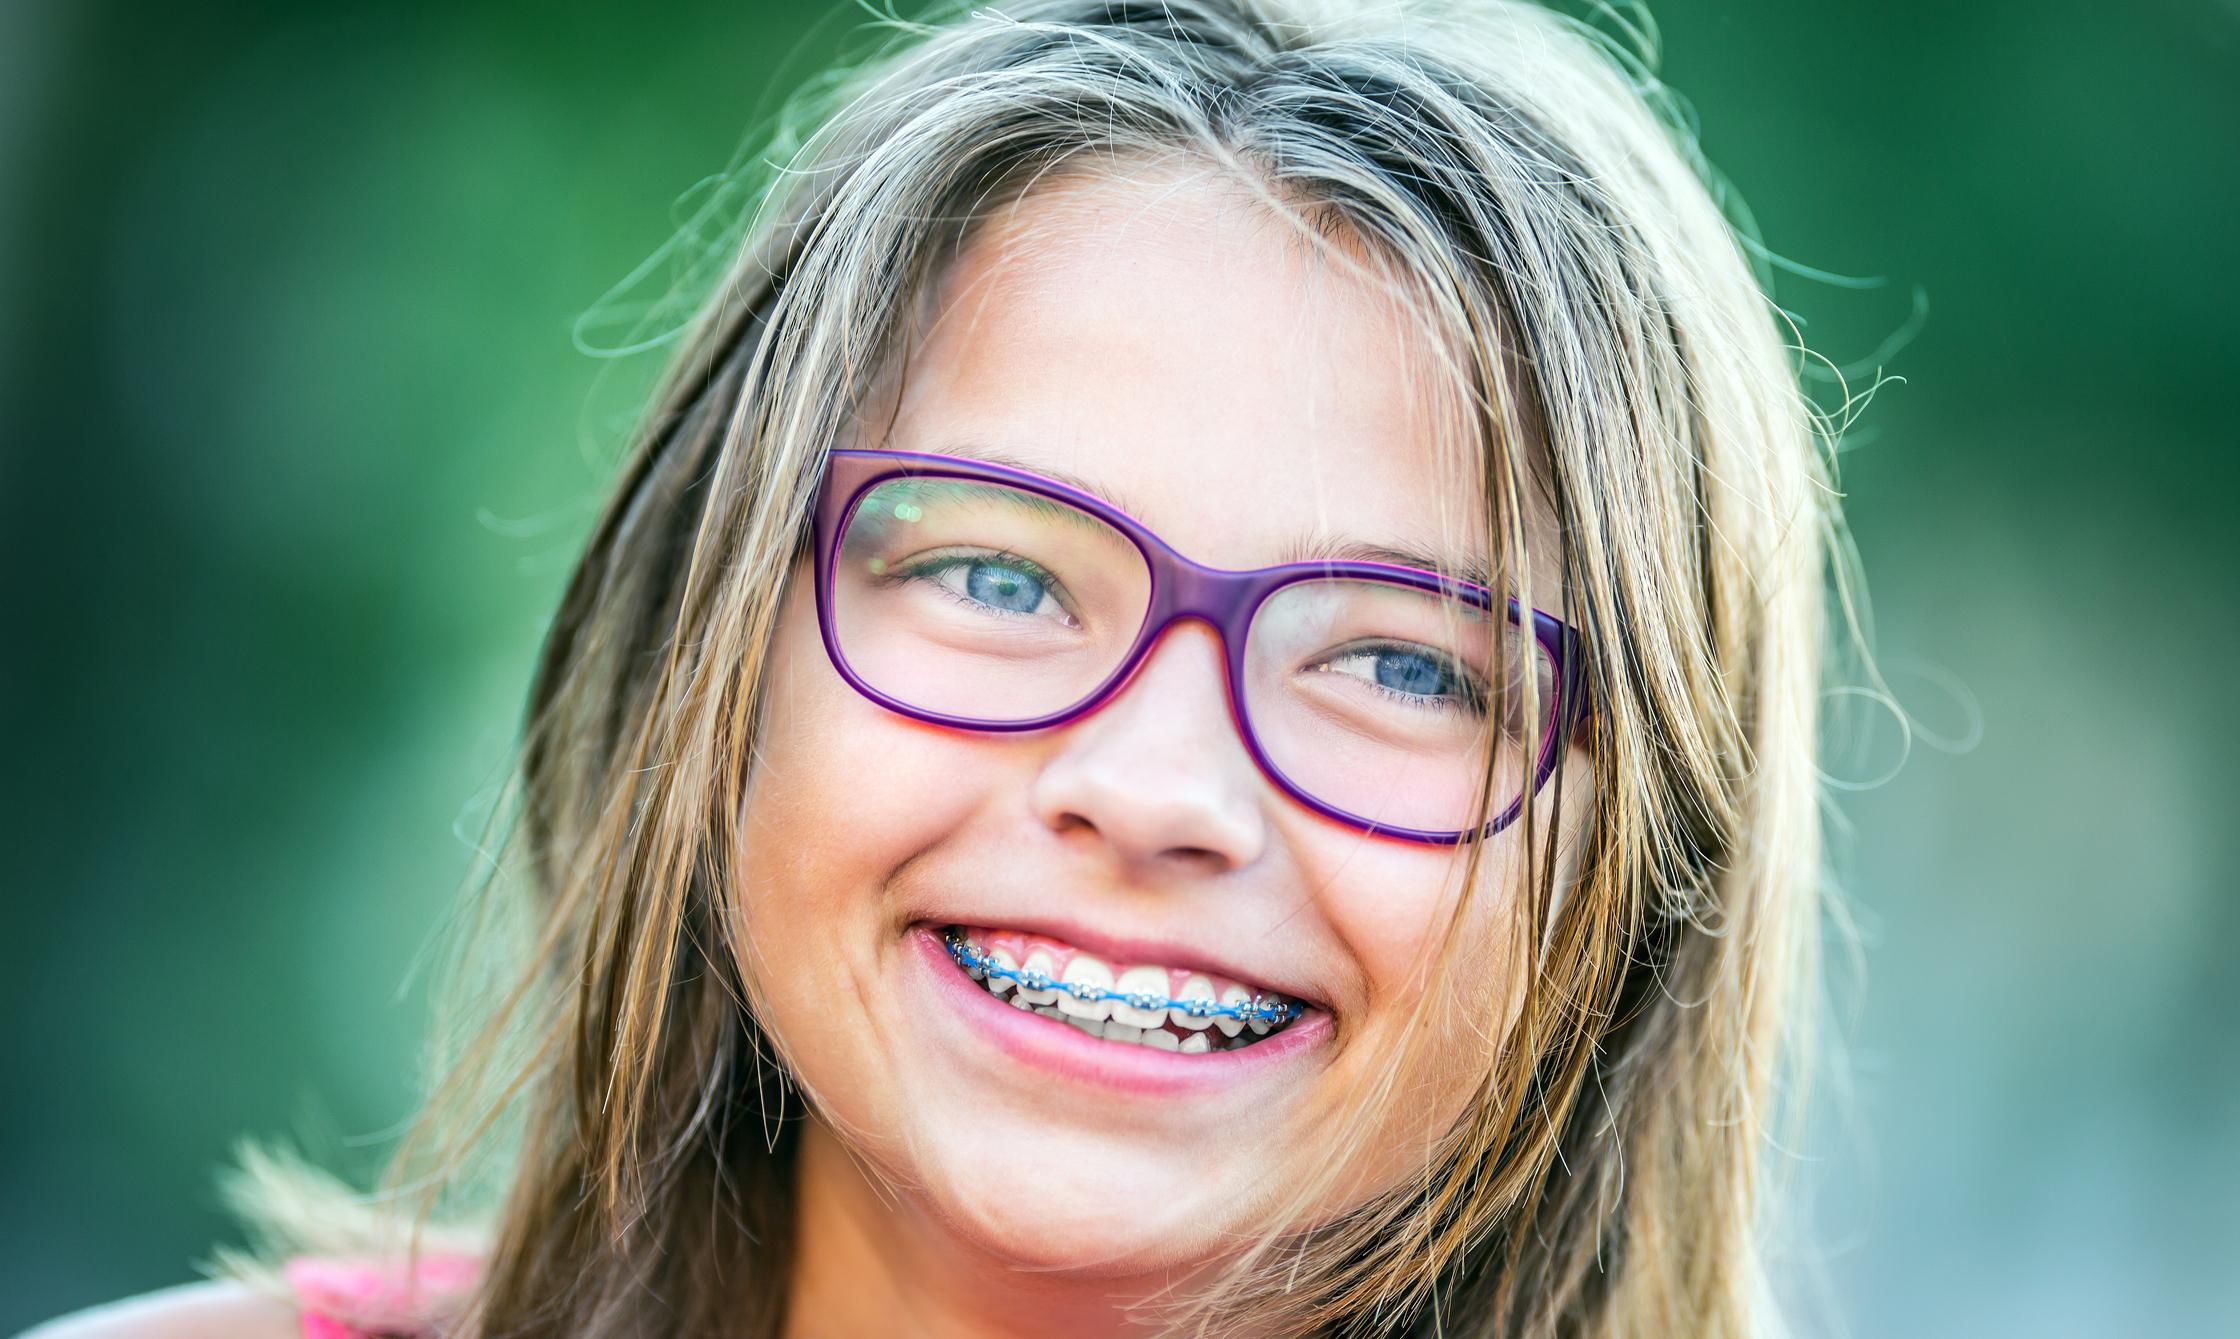 Photo of ما هي الحالات التي تستدعي دعامة الاسنان للطفل؟